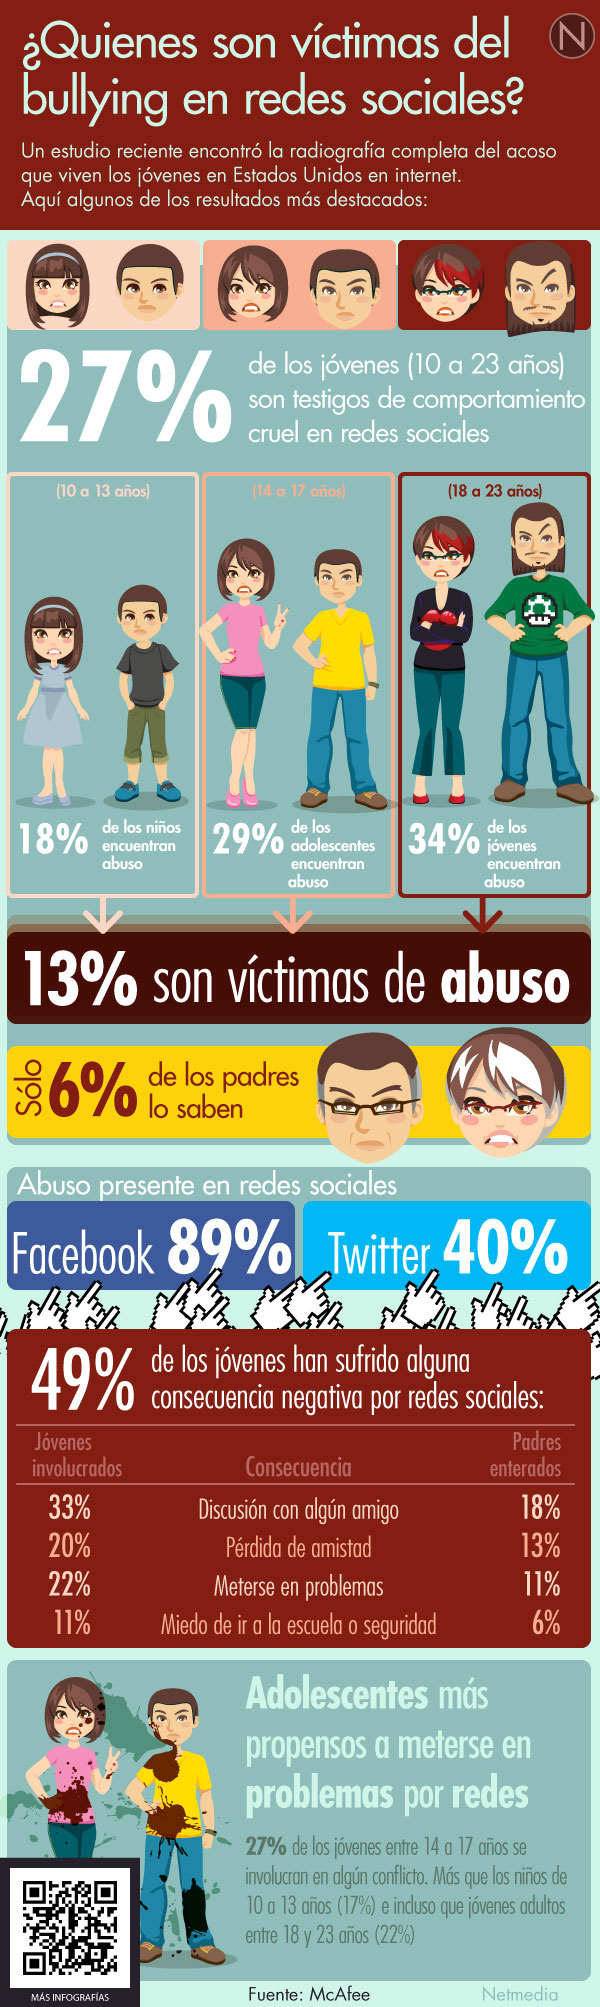 victimas-bullying-redes-sociales-infografia.jpg